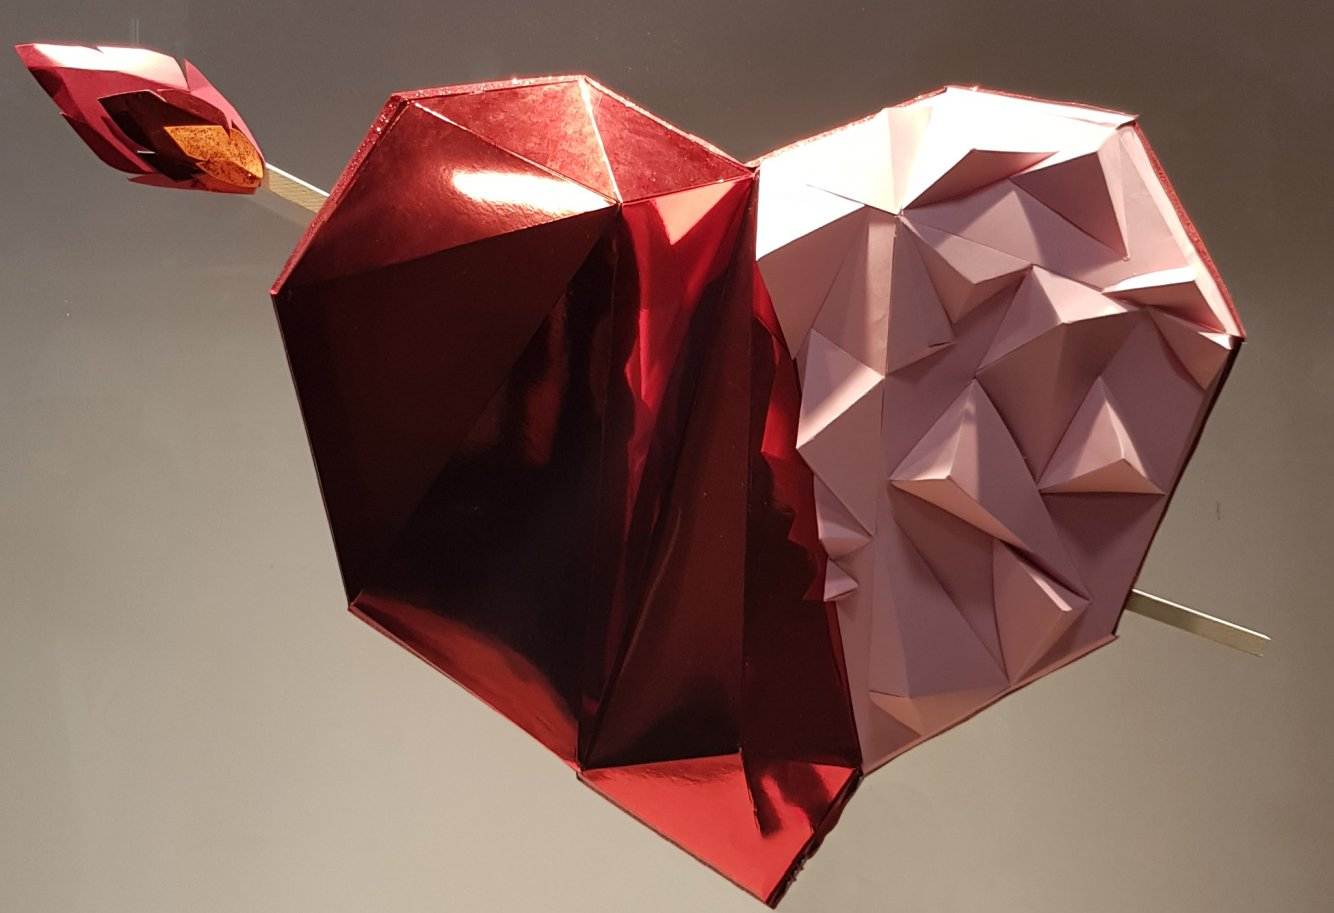 Geometrías románticas (2019) - Marta Herrero Arias - Missmsmith - Arte en papel